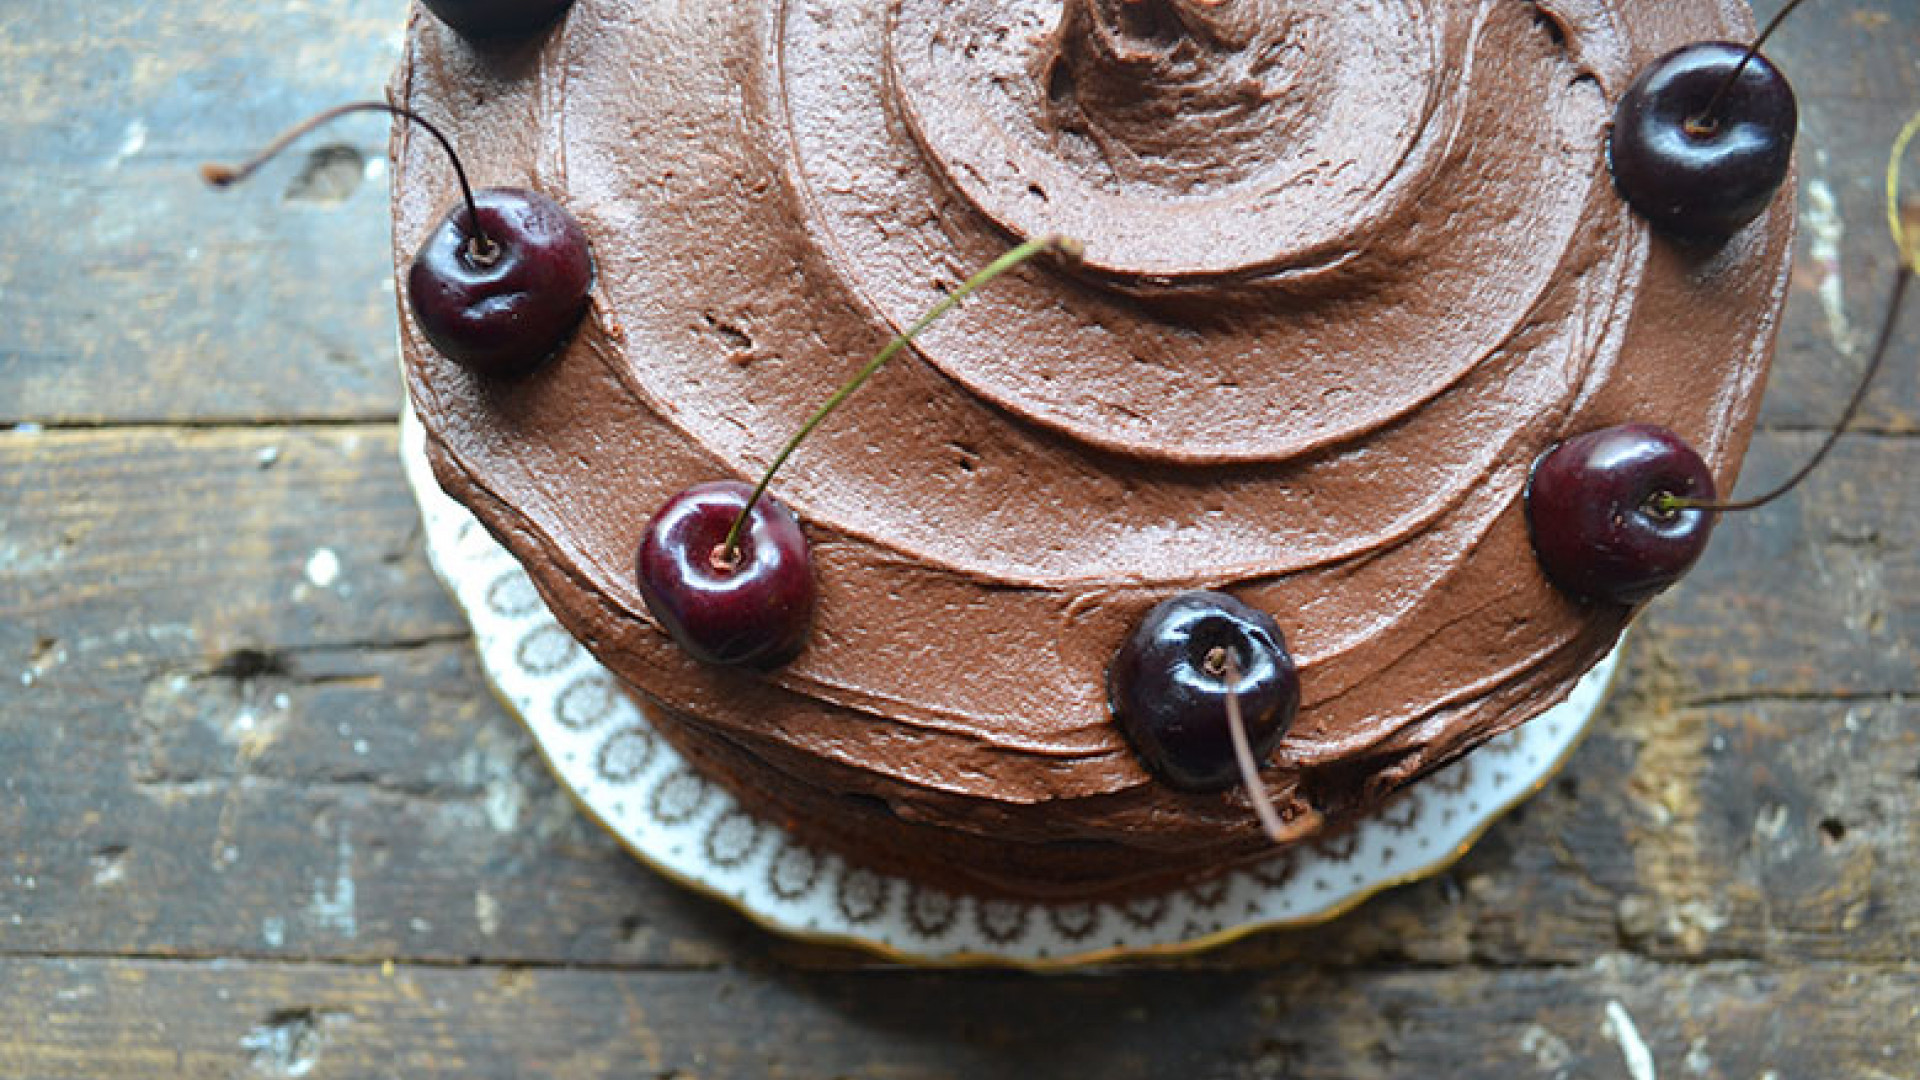 Lovecrumbs cake Edinburgh